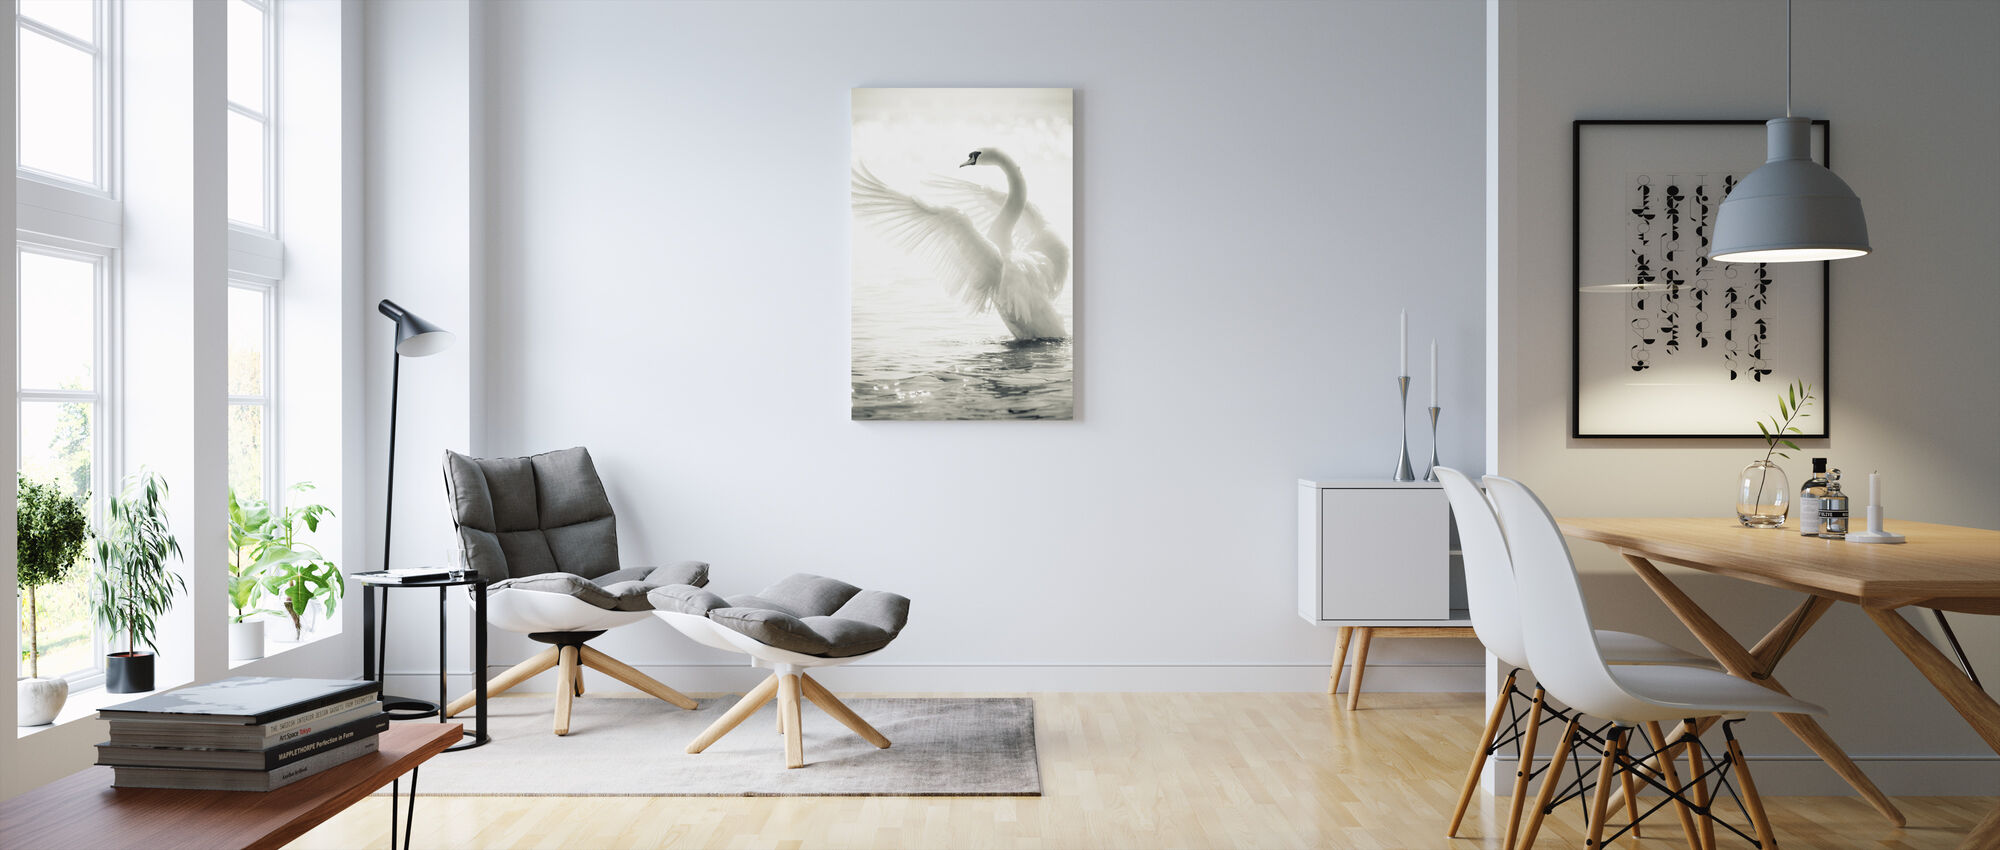 Graceful Swan - Canvas print - Living Room